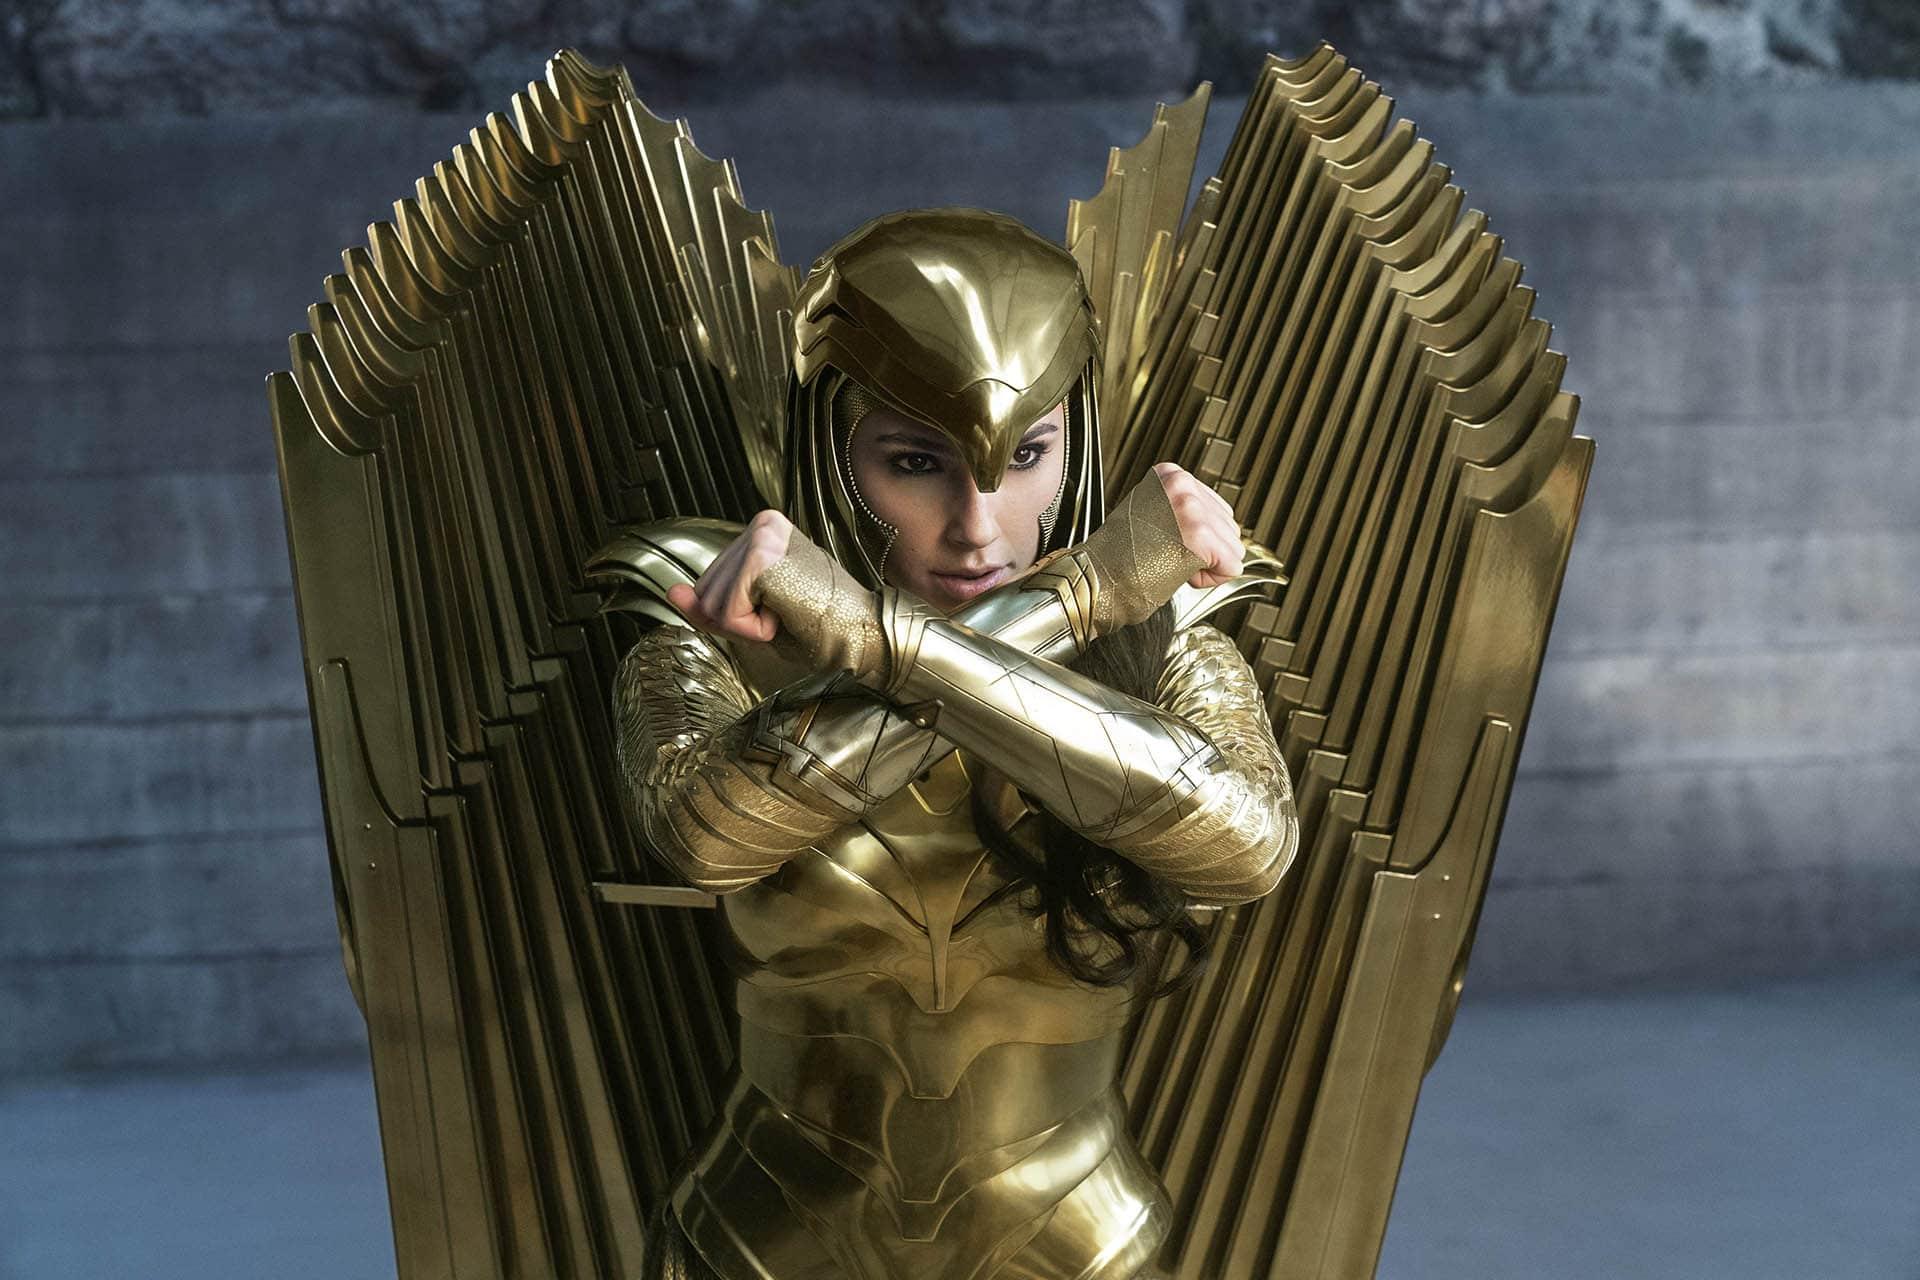 L'armatura d'oro di Wonder Woman